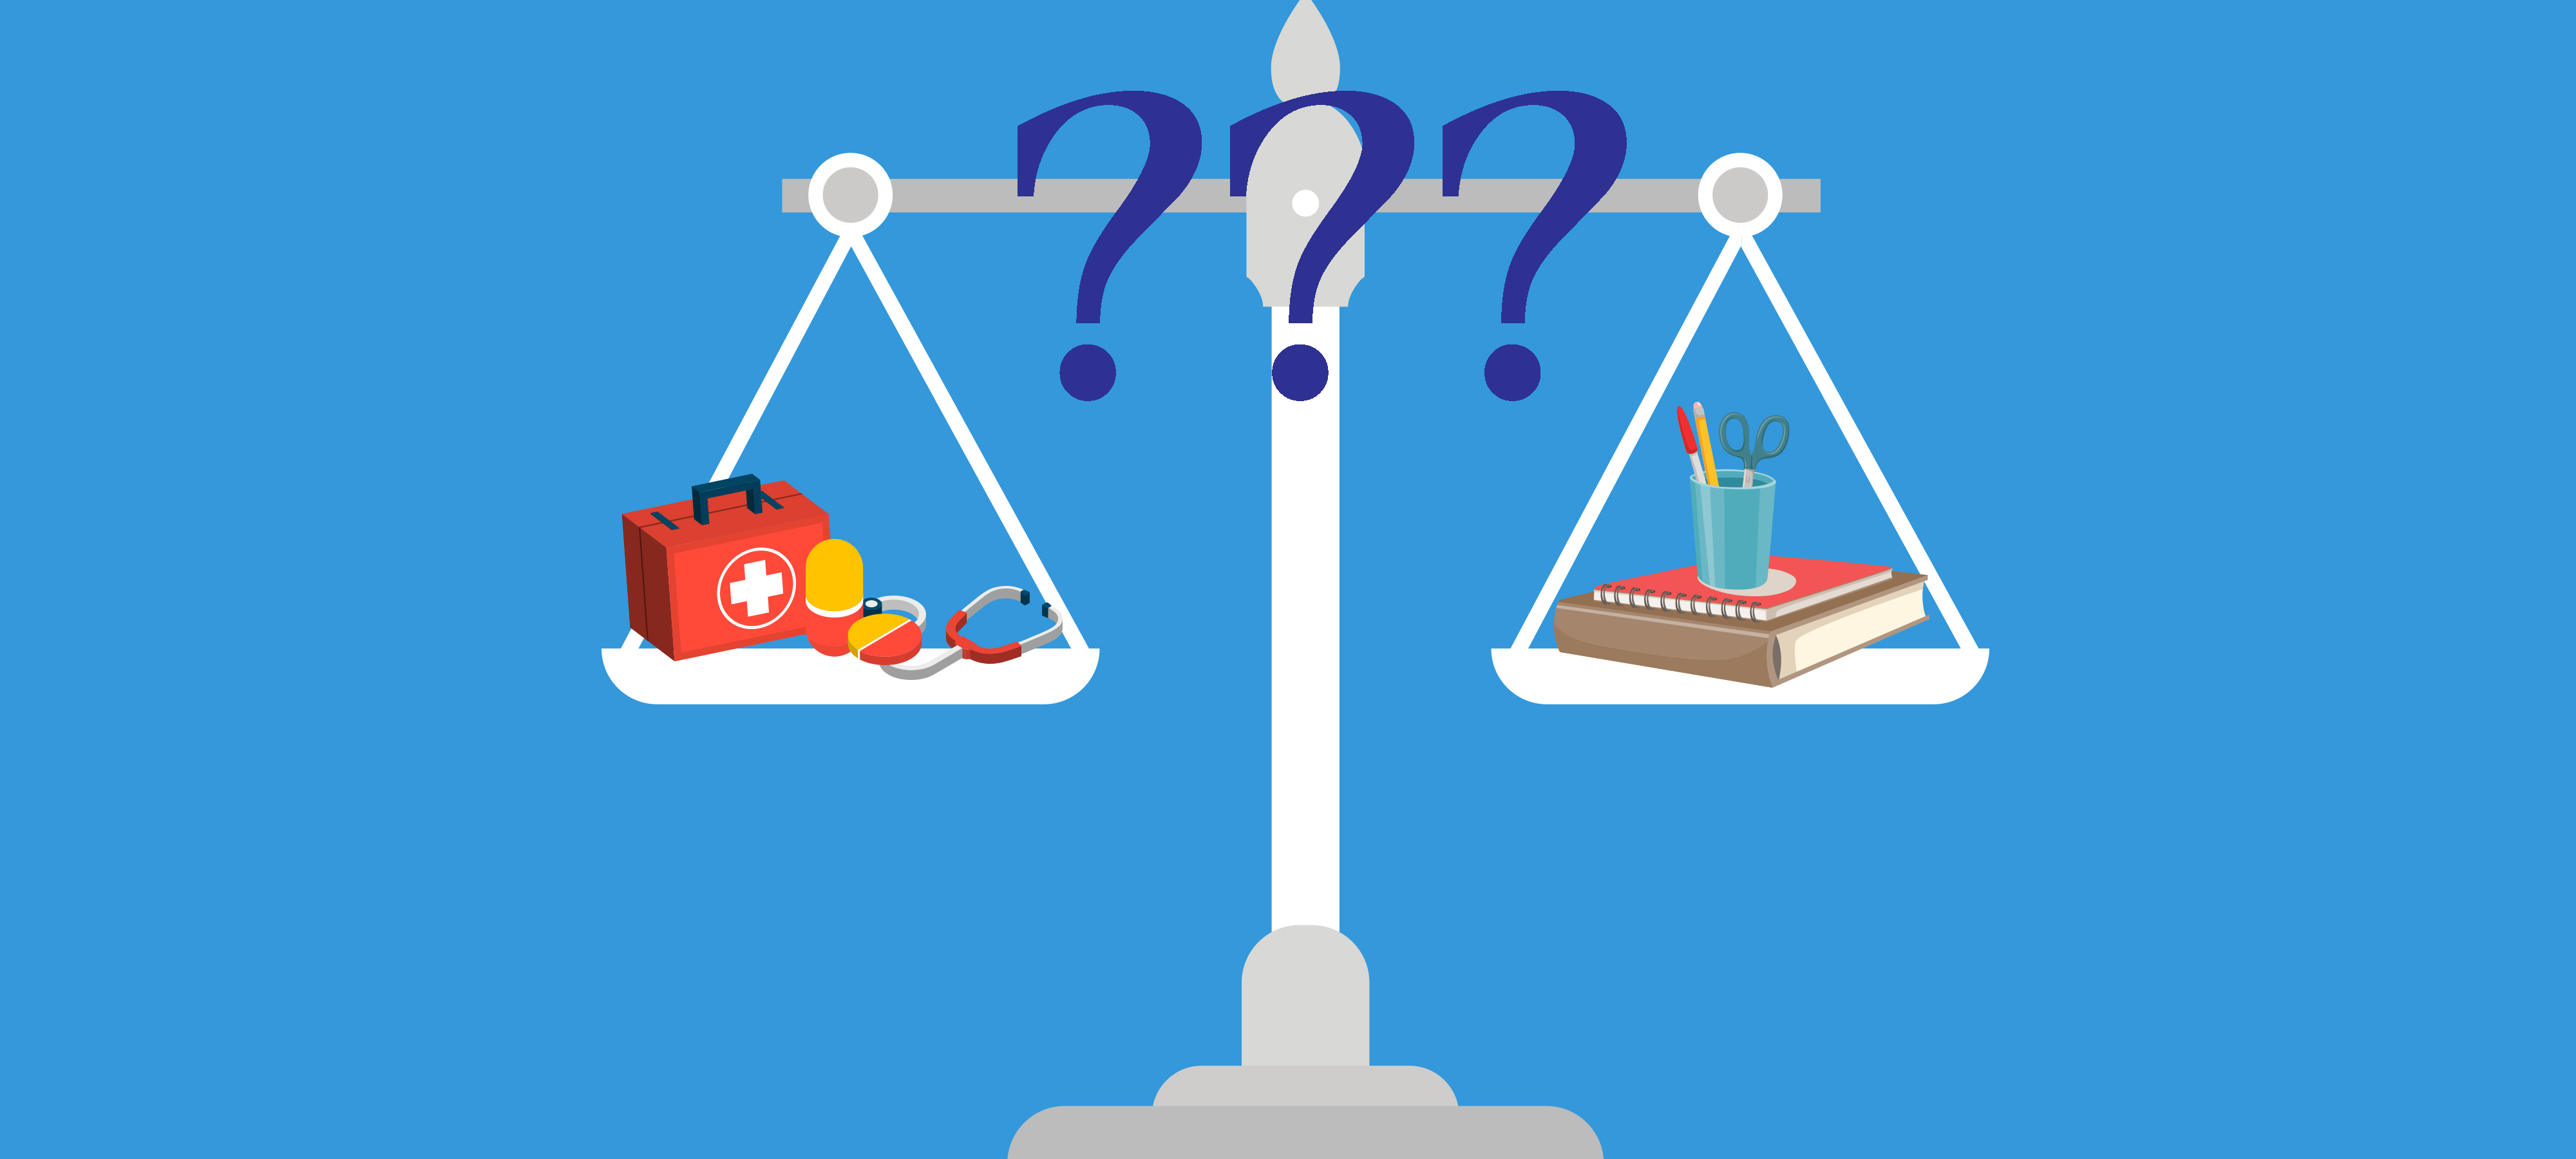 خانم دکتر بودن بهتره یا خانم معلم بودن؟